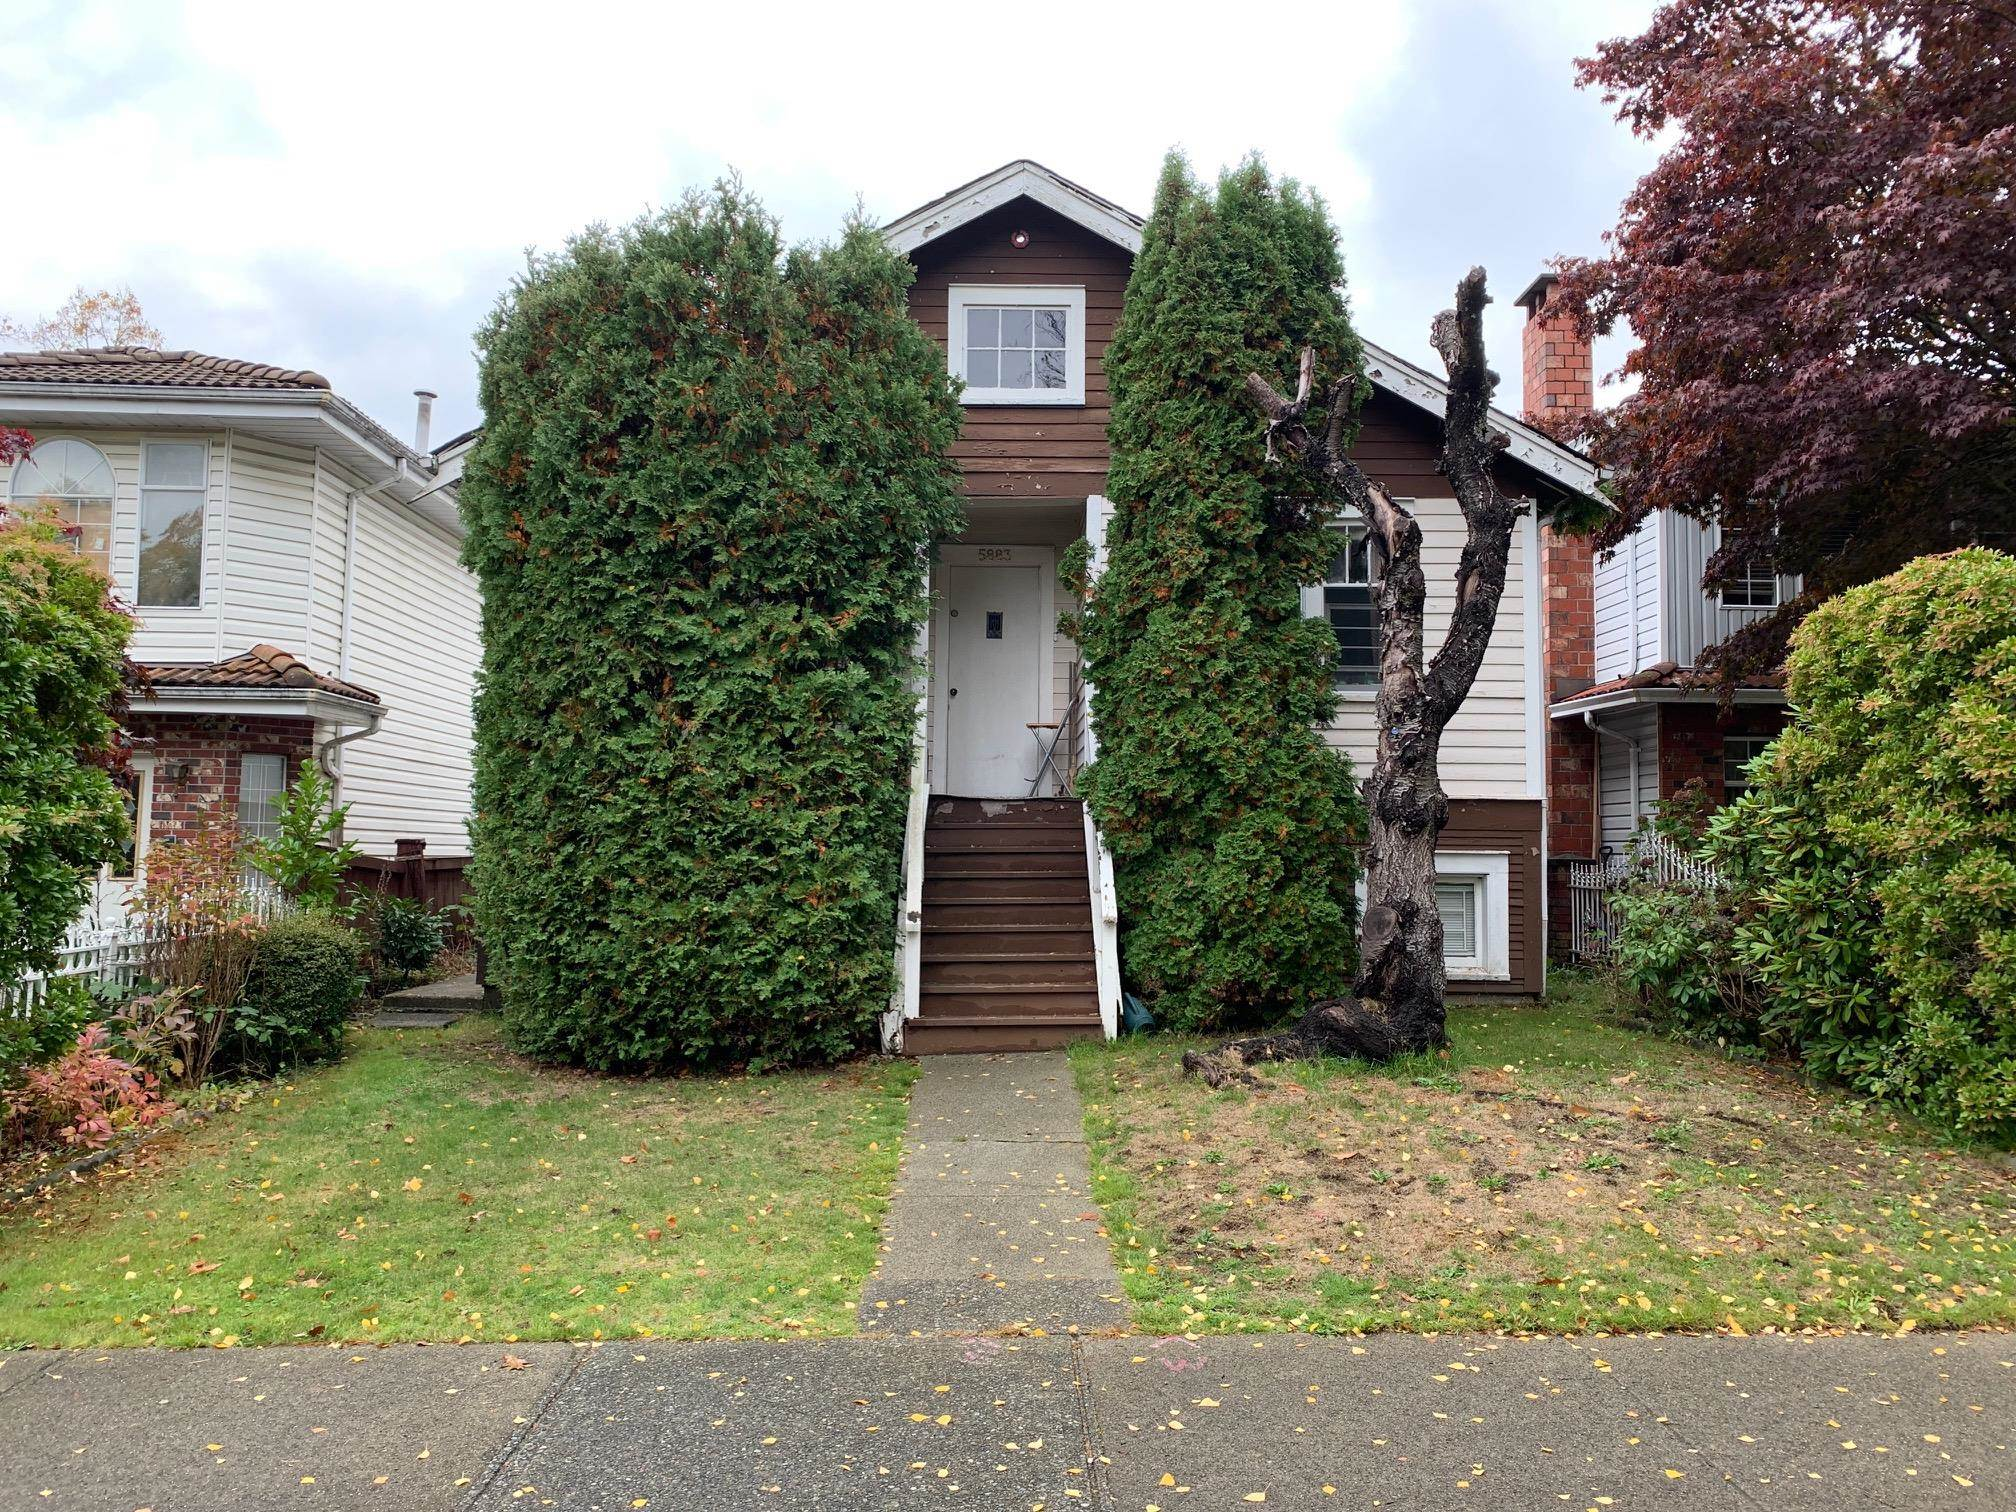 5883 SOPHIA STREET - Main House/Single Family for sale, 3 Bedrooms (R2625371) - #1